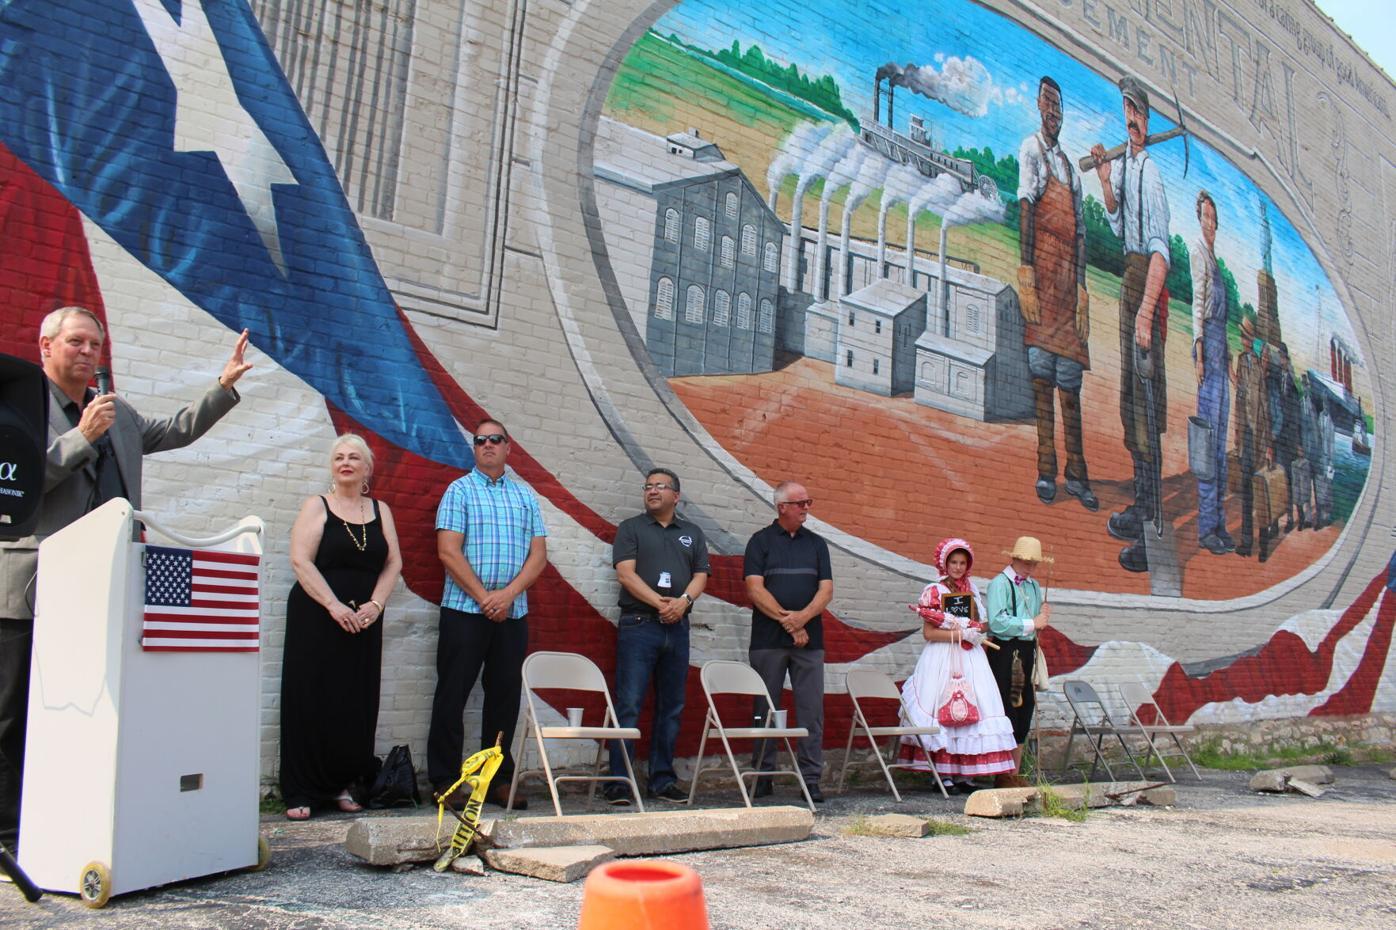 Mural celebrates local immigrants' contributions to America